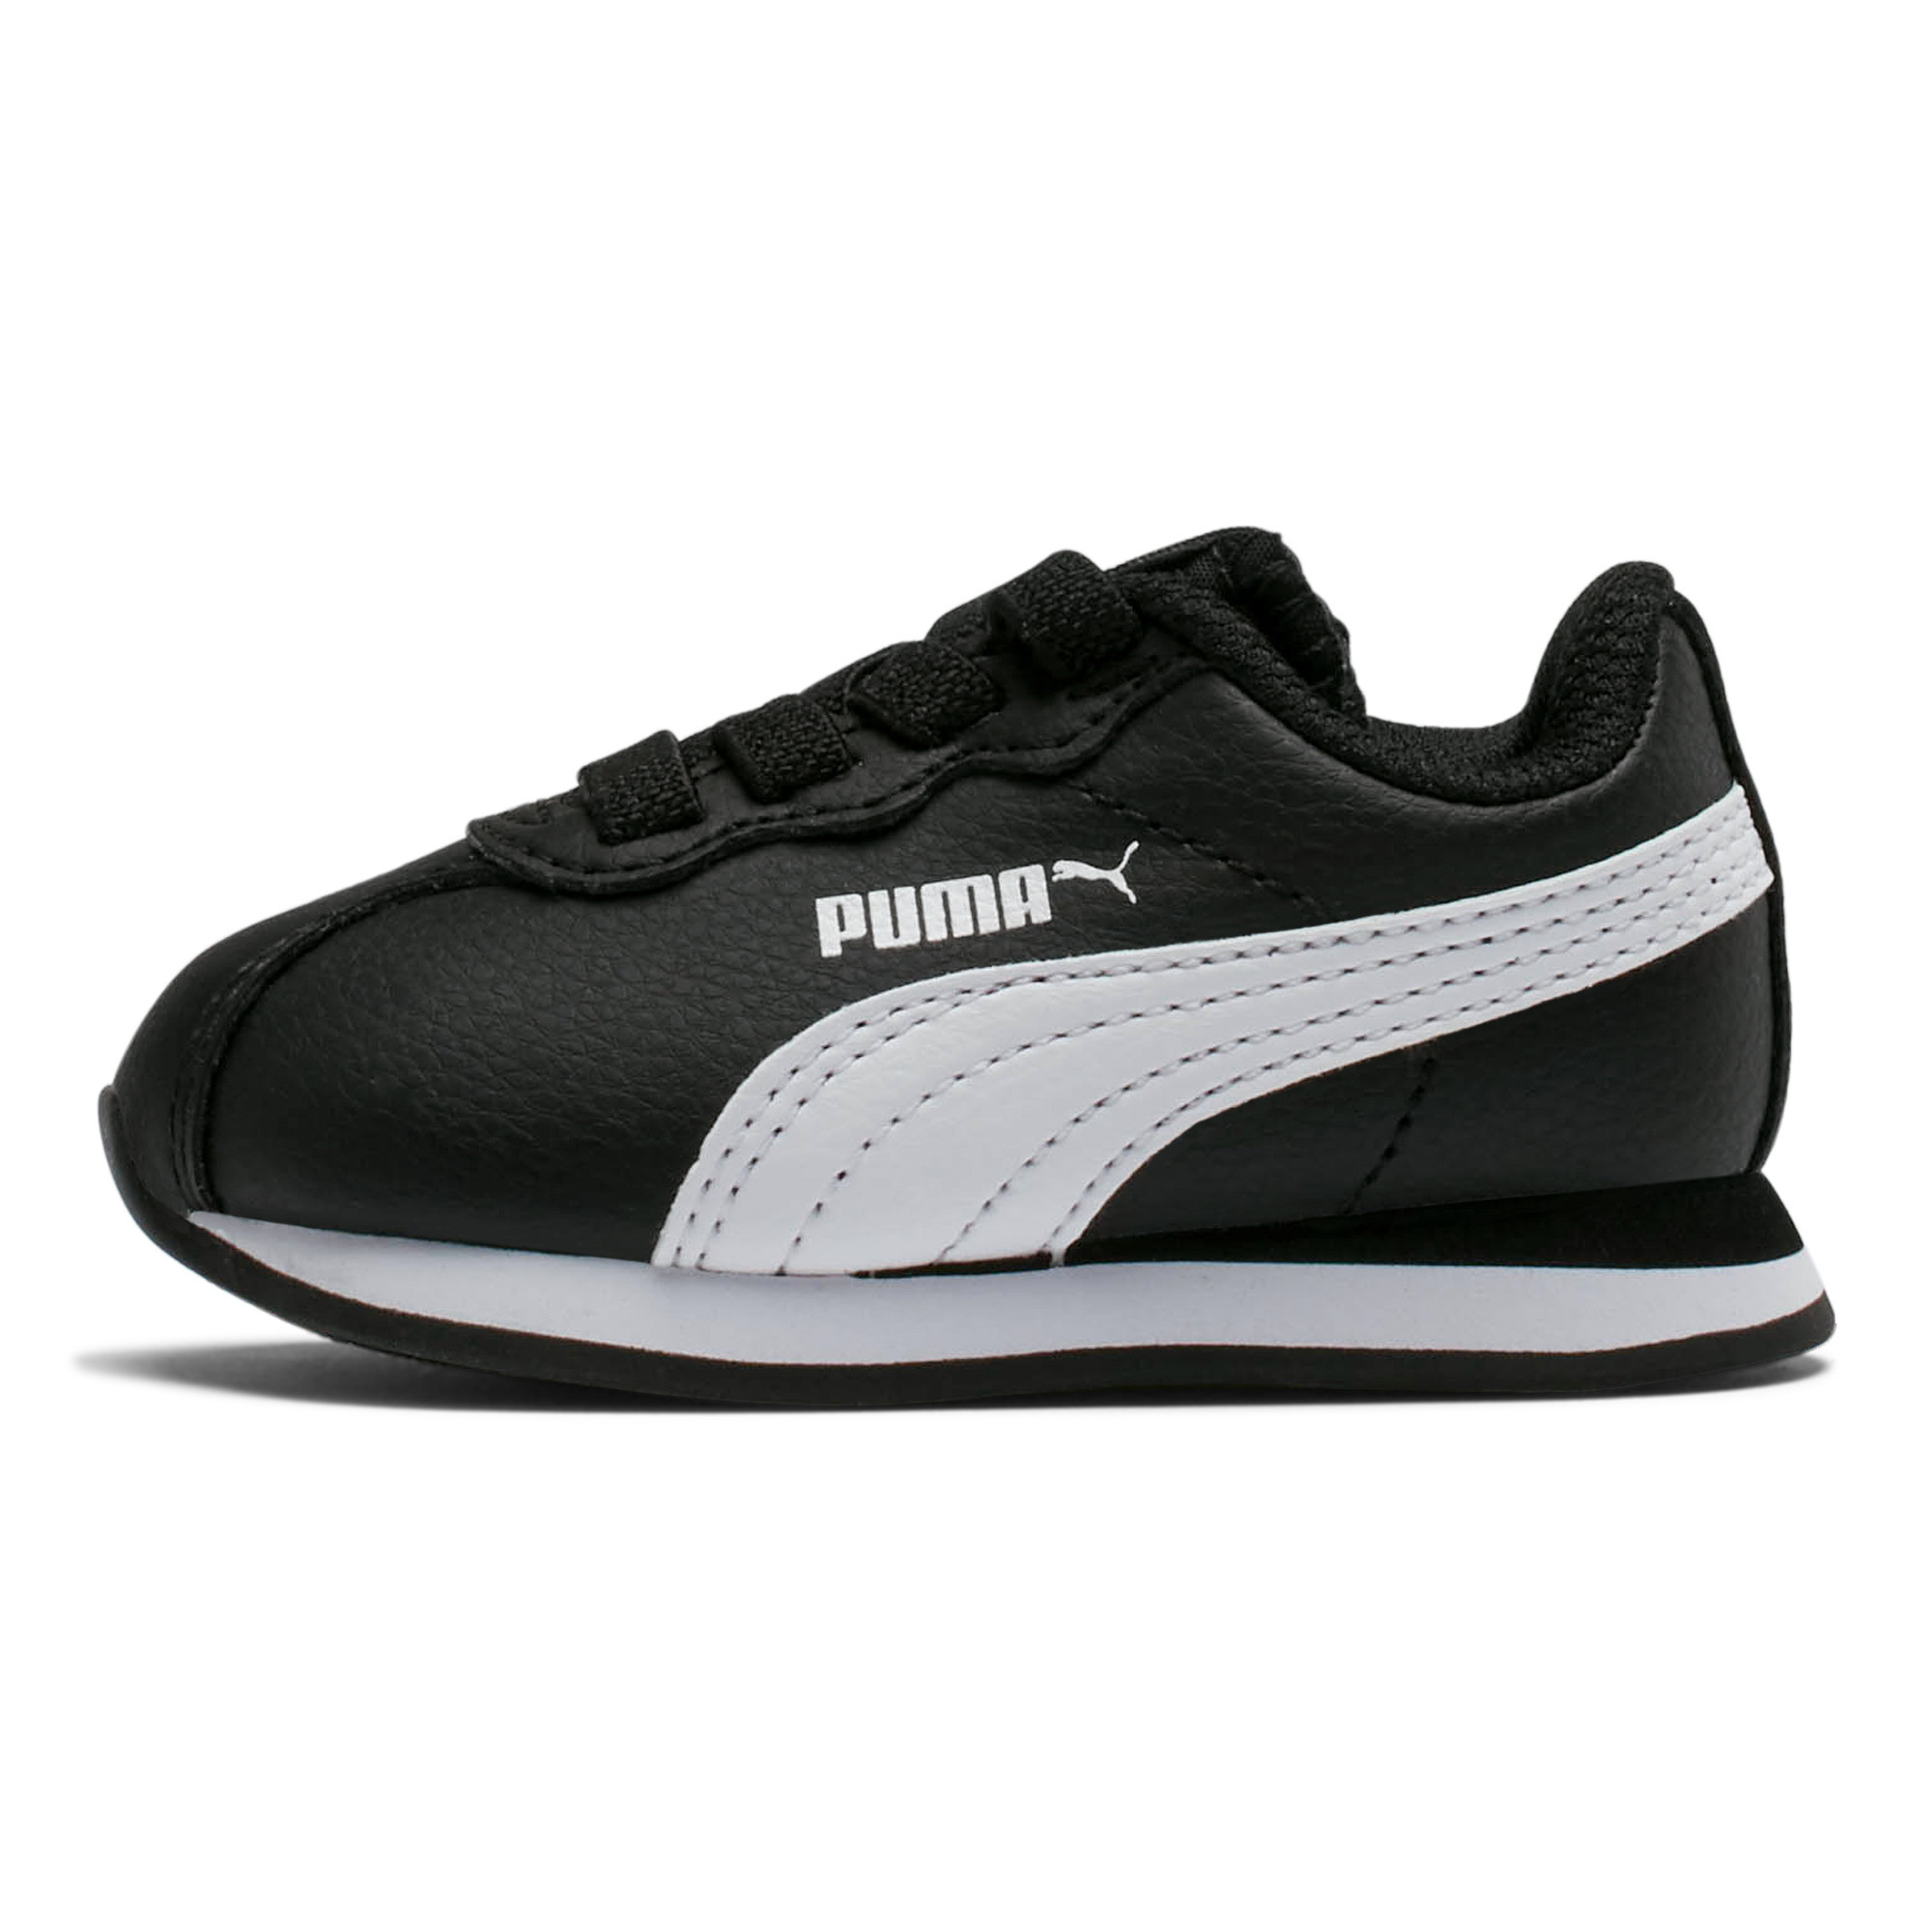 PUMA-Turin-II-AC-Toddler-Shoes-Unisex-Shoe-Kids thumbnail 9